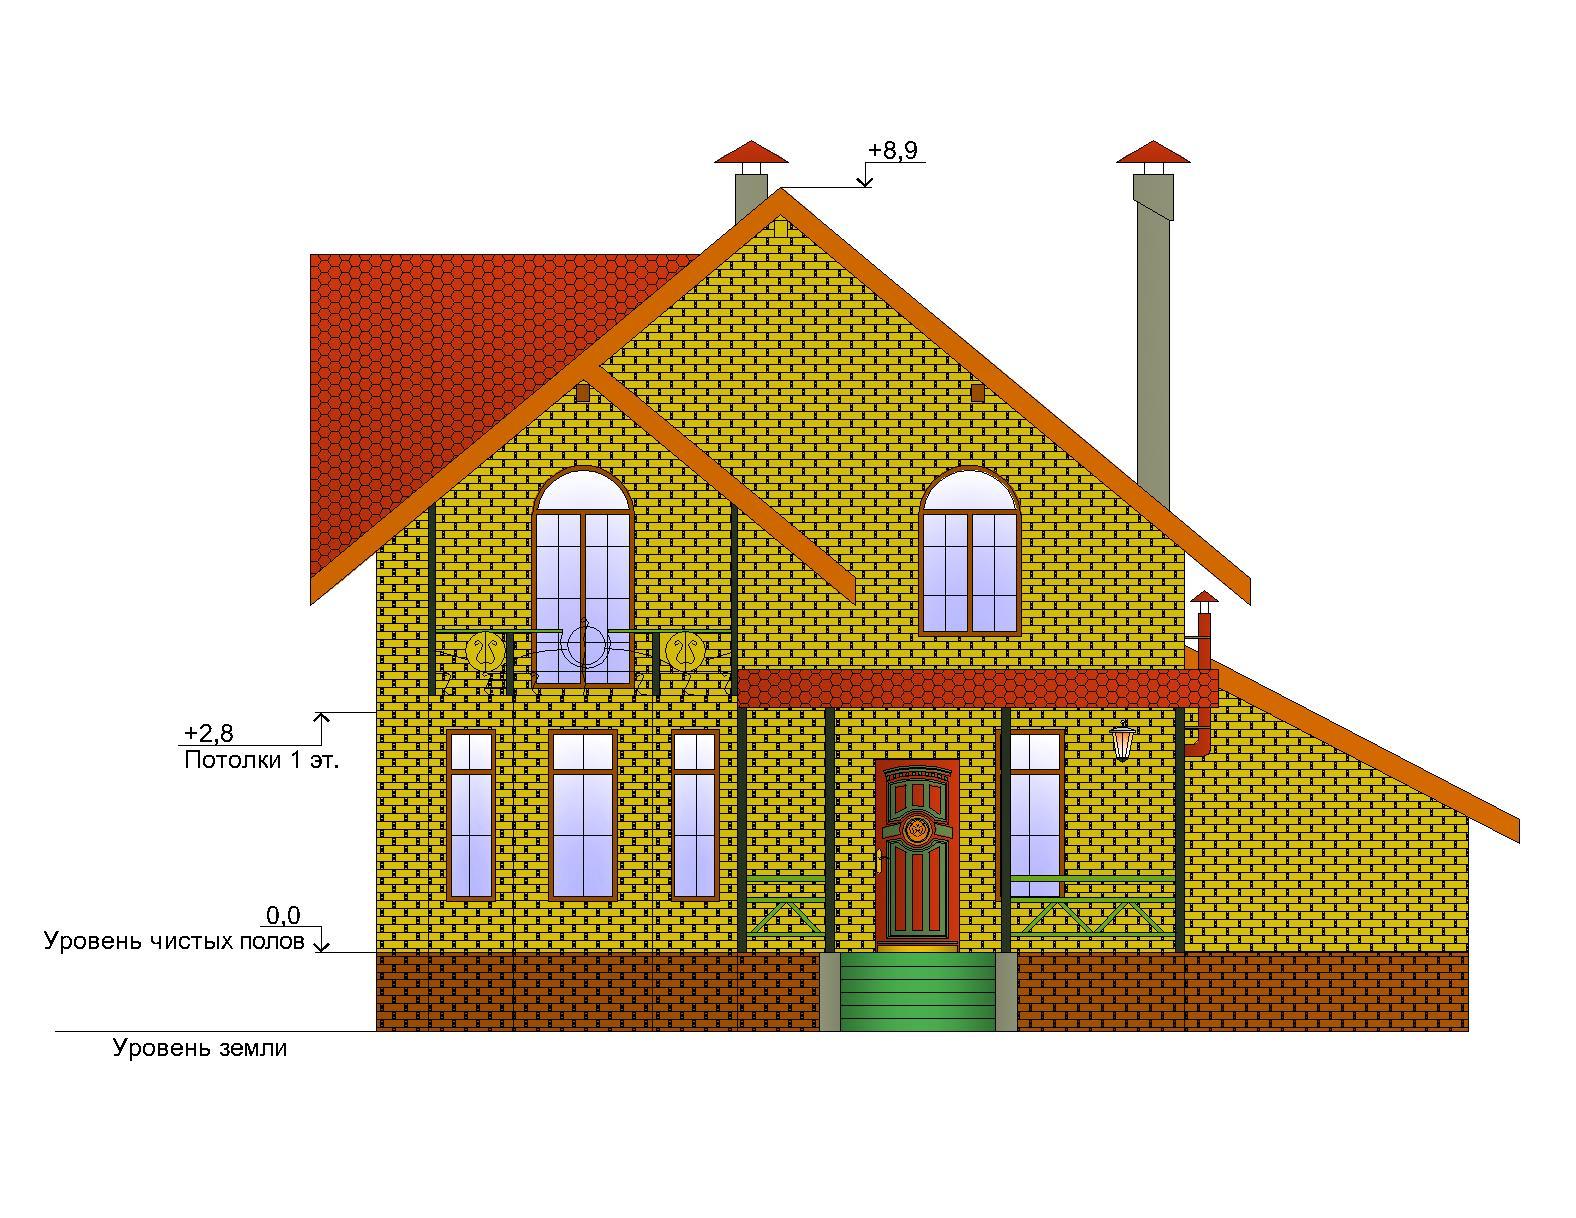 Готовый проект дома 139 кв.м // Артикул ОК-152 фасад